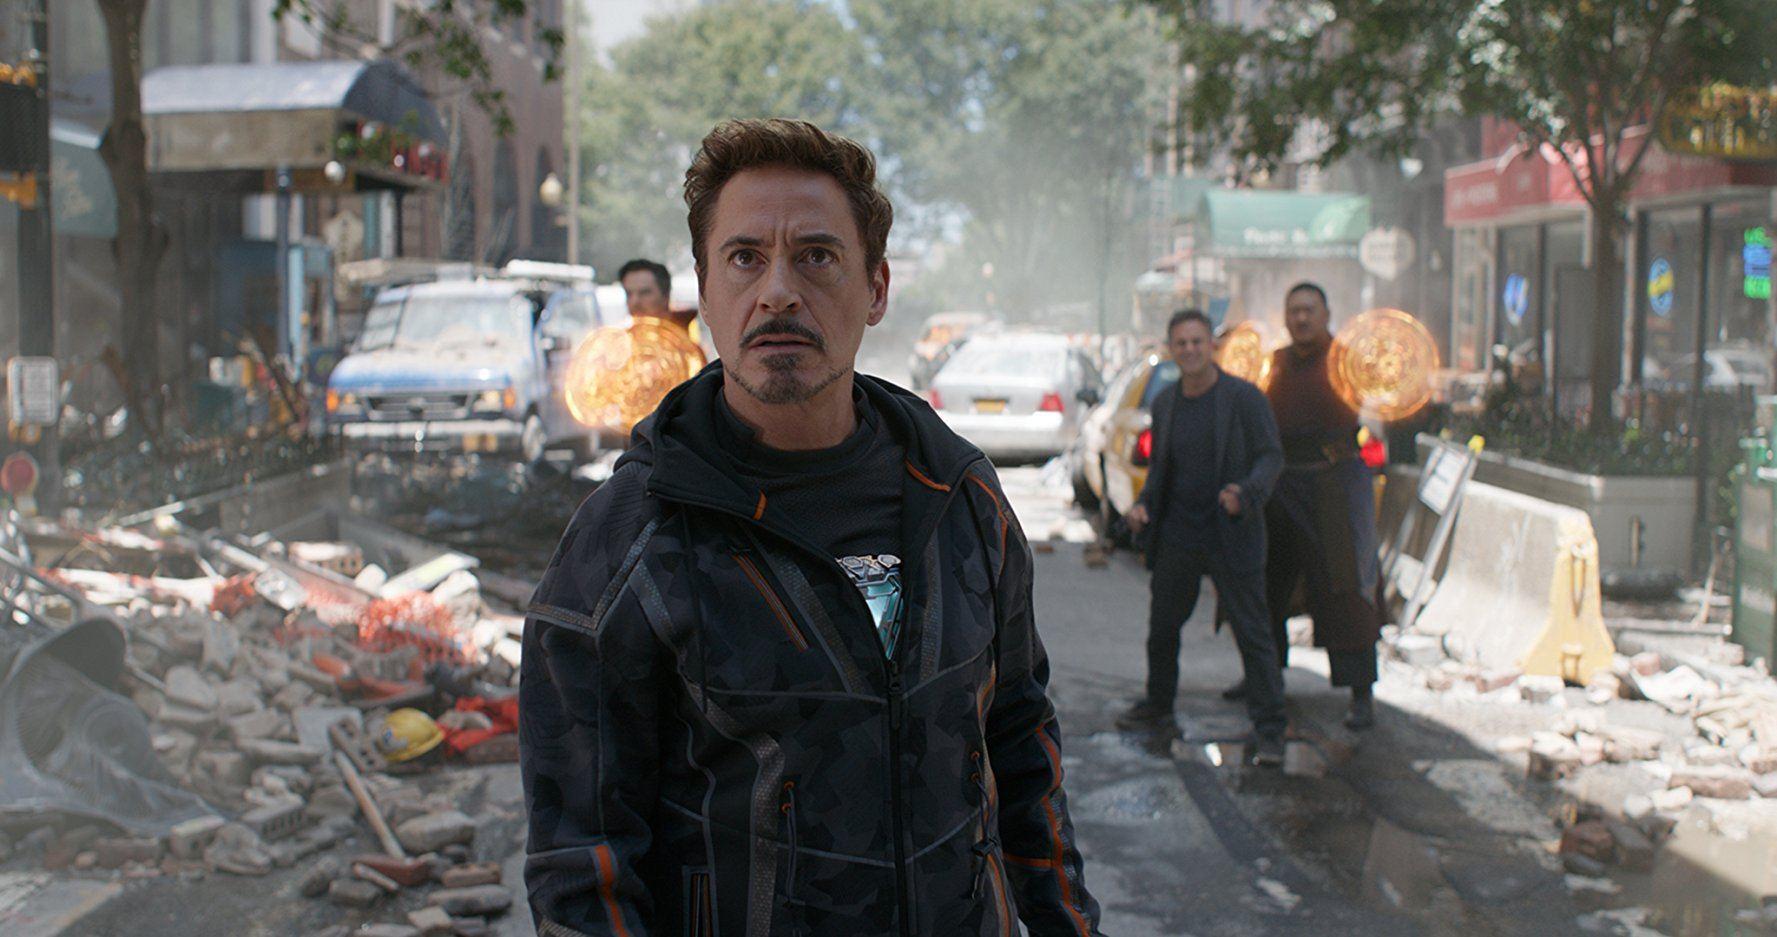 Robert Downey Jr. in Avengers: Infinity War